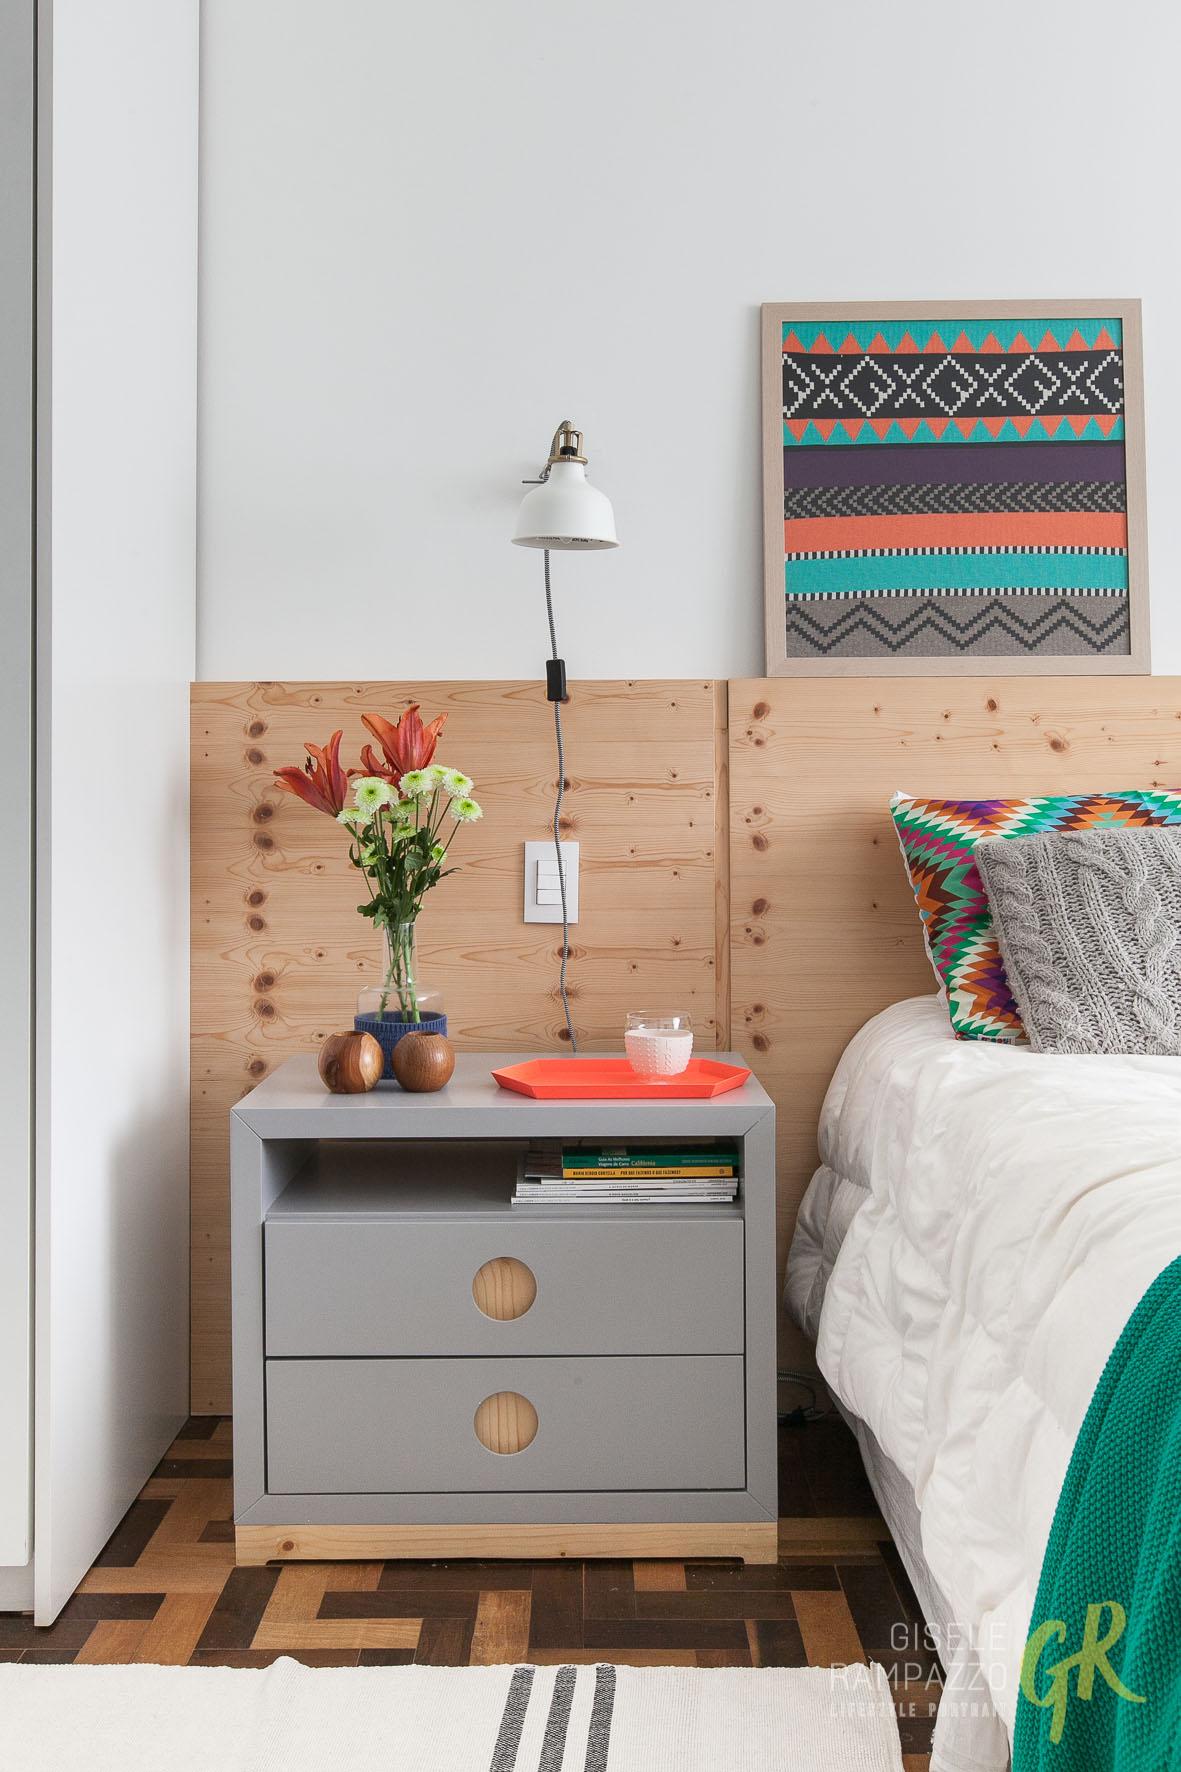 Hist Rias De Casa Decora O Escandinava Colorida Gisele Rampazzo ~ Tecido Para Parede De Quarto Casal